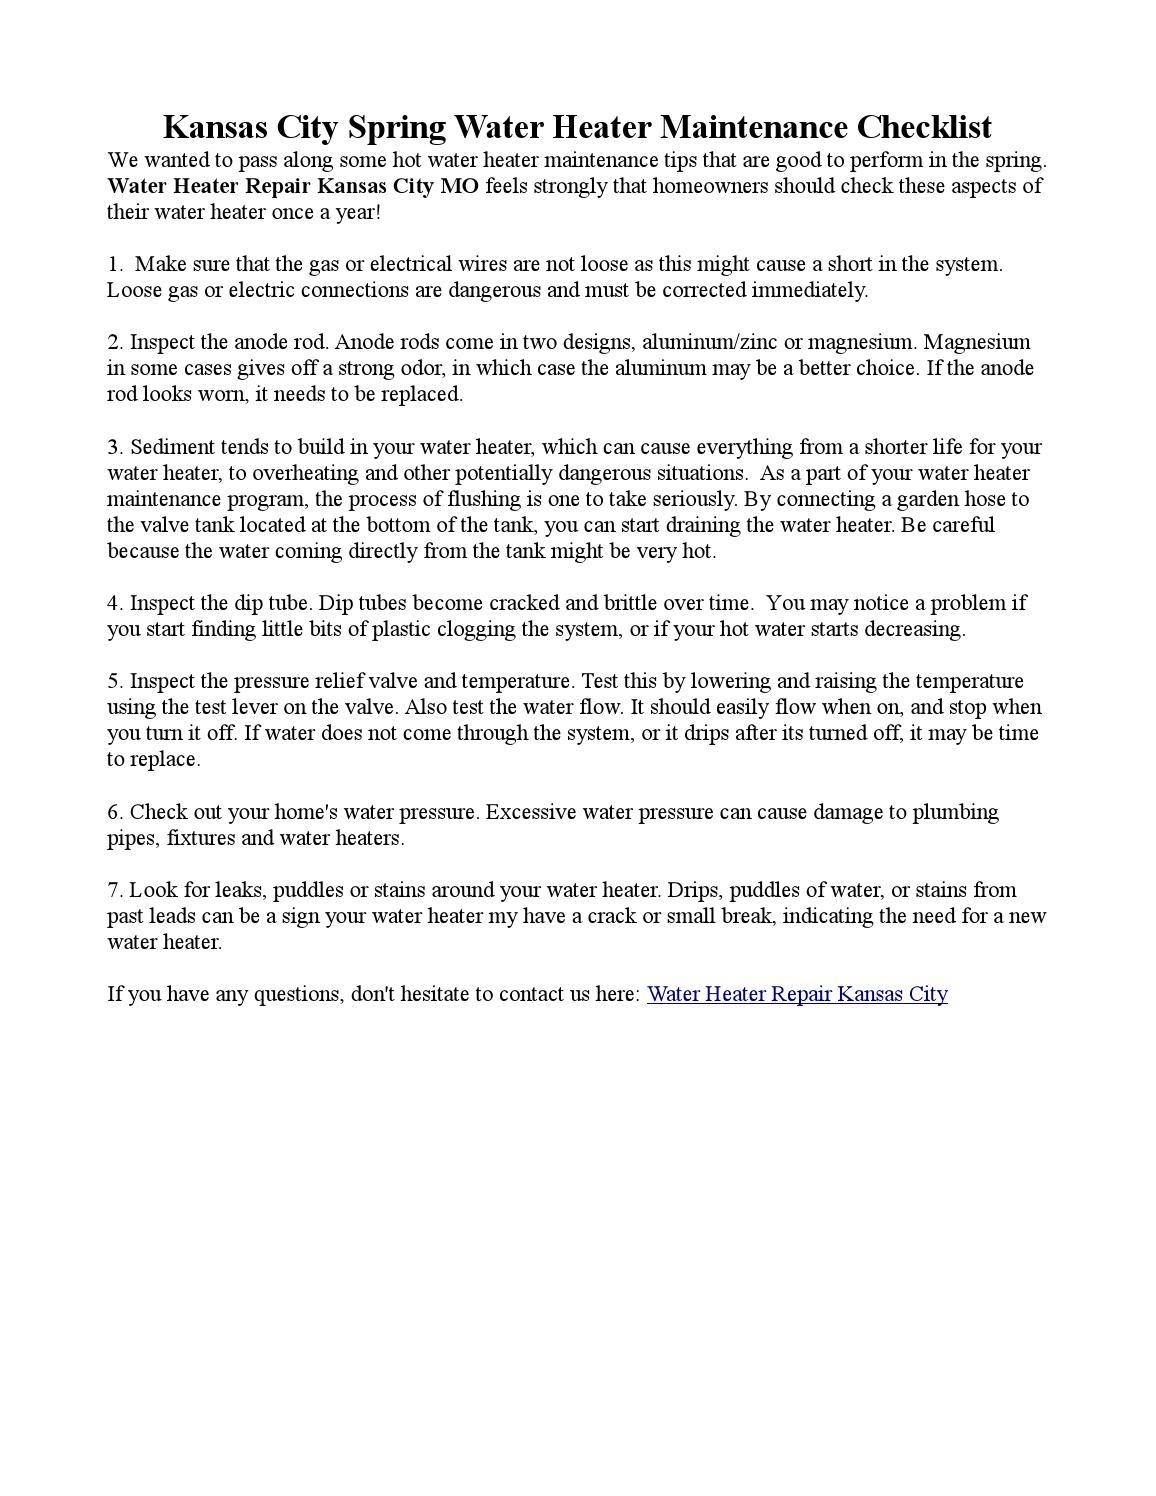 Kansas City Spring Water Heater Maintenance Checklist By